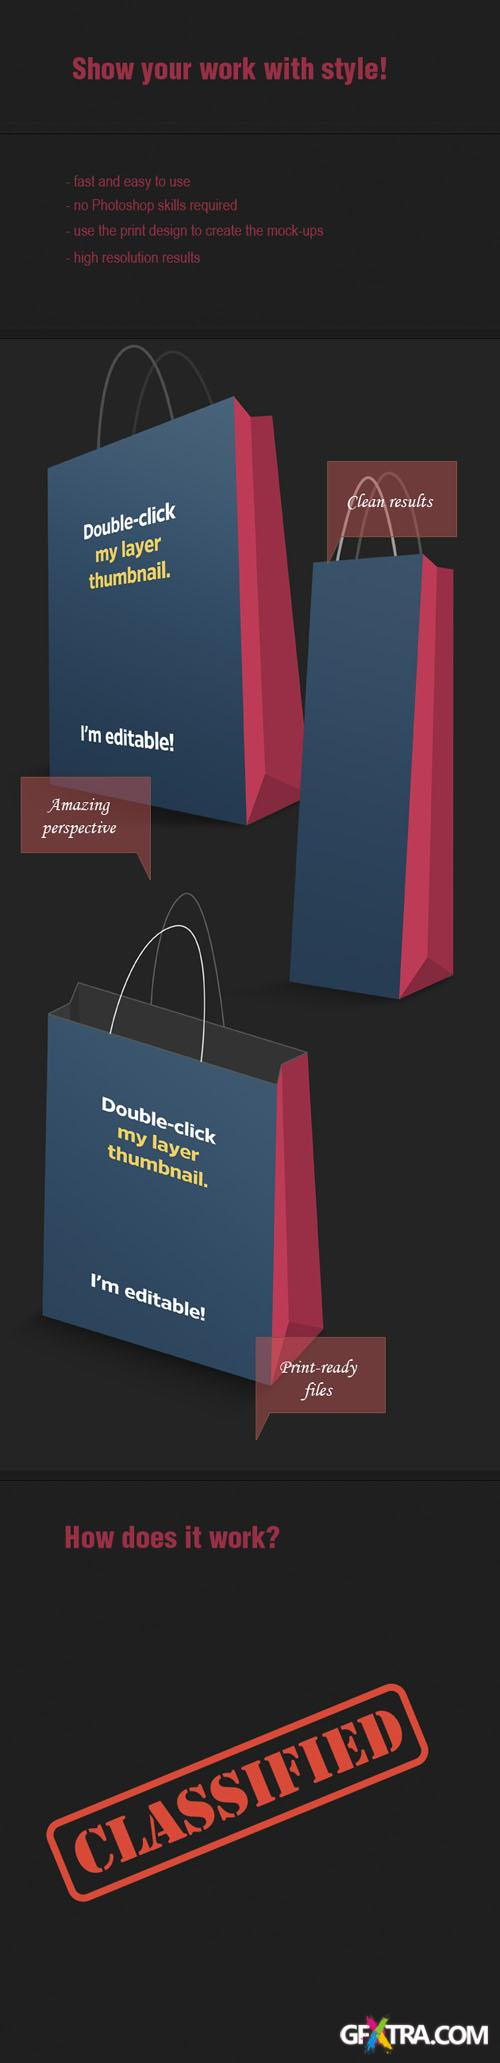 Designtnt - Shopping Bags PS Mock-ups